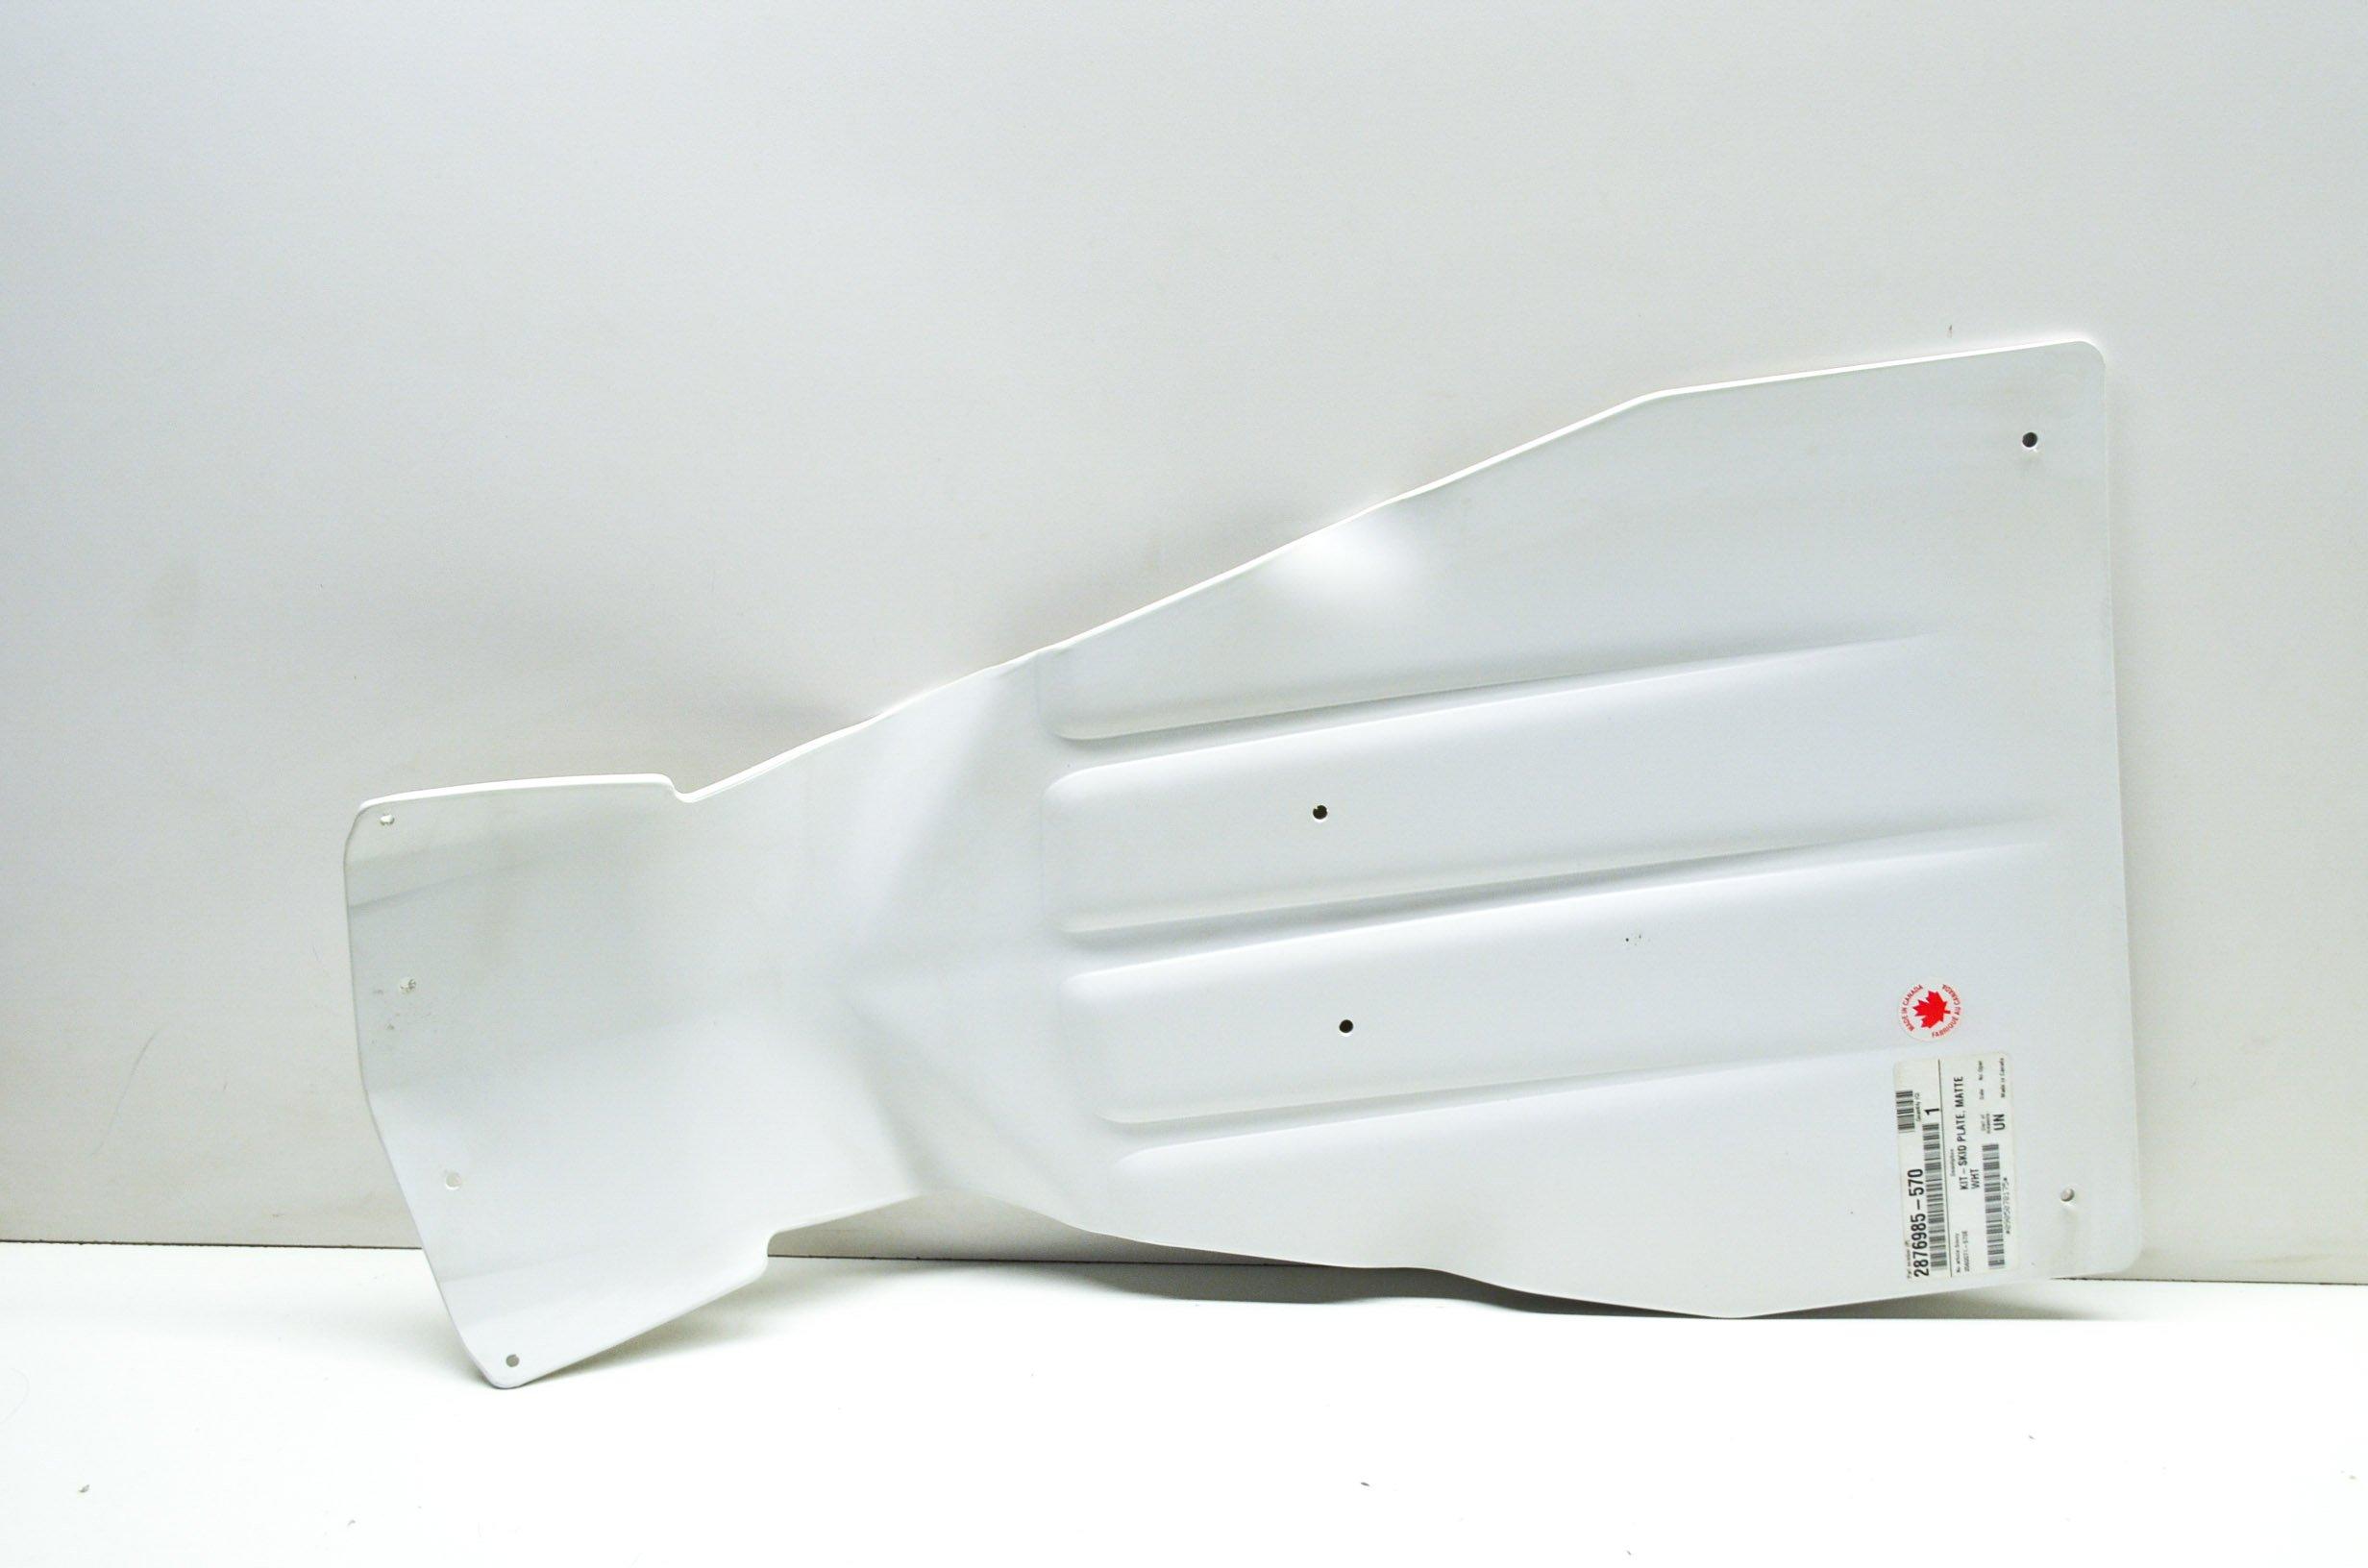 SKID PLATE, WHITE, 2009-2013 POLARIS IQ SNOWMOBILES , Genuine Polaris OEM ATV / Snowmobile Part